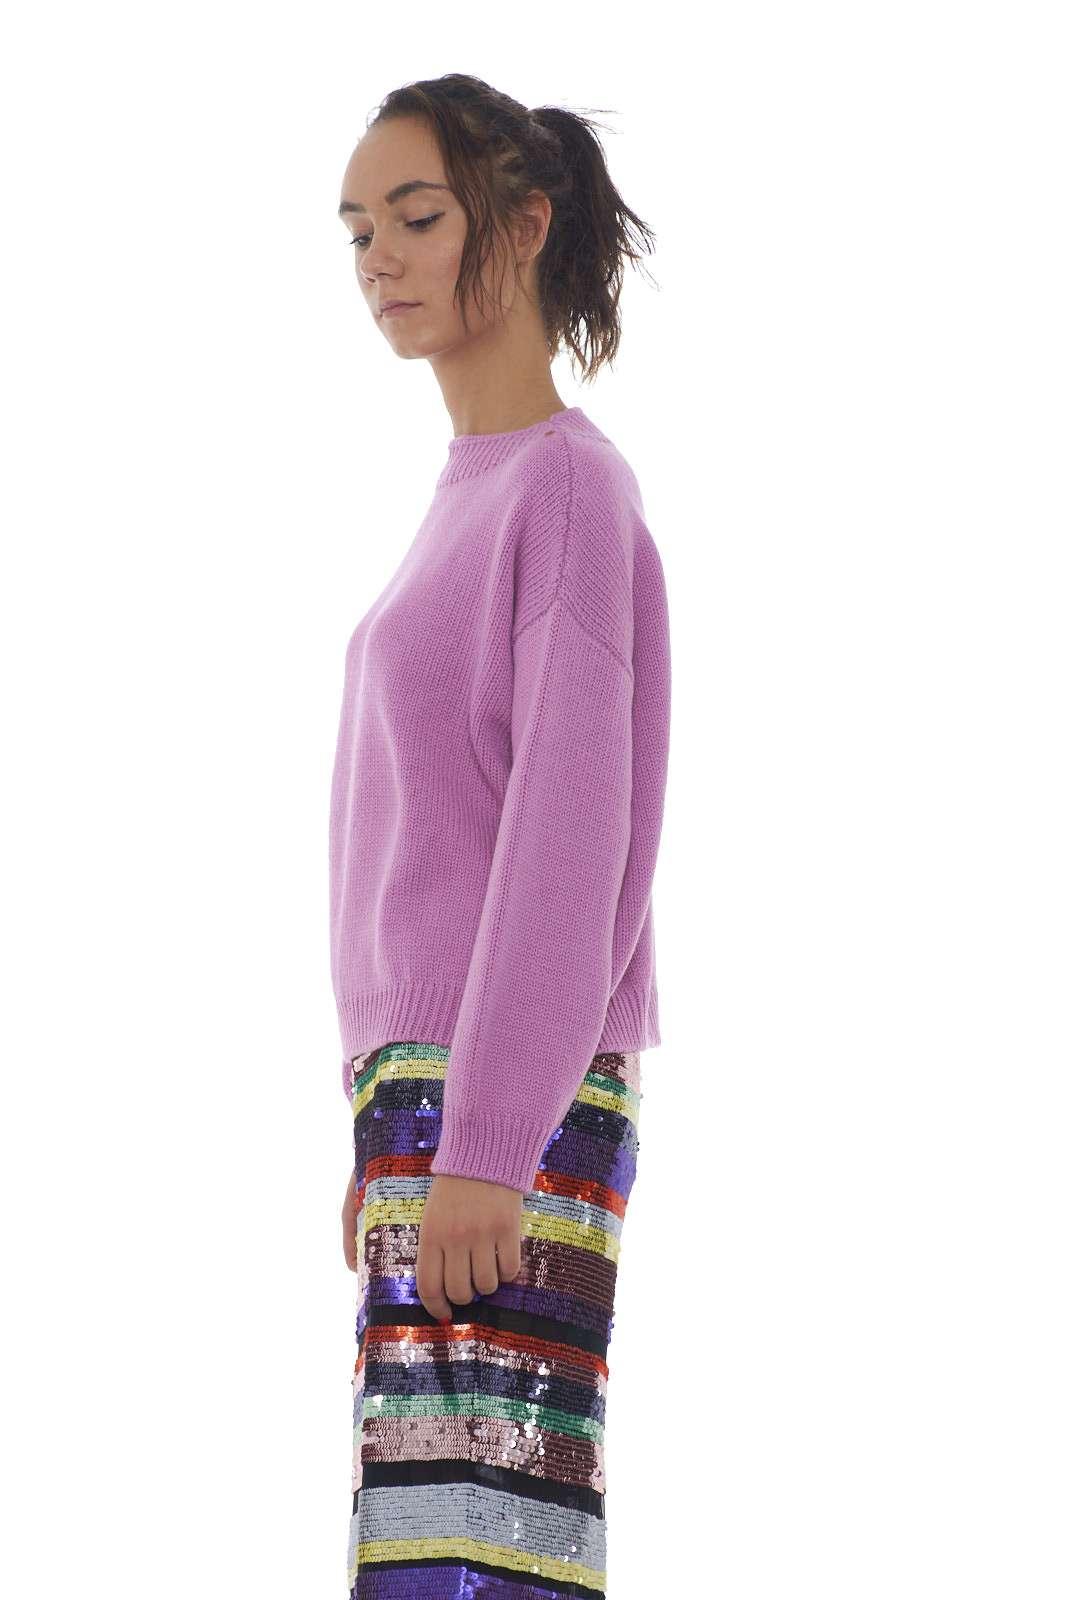 https://www.parmax.com/media/catalog/product/a/i/AI-outlet_parmax-maglia-donna-Miki-Za-MZKW00048-B.jpg